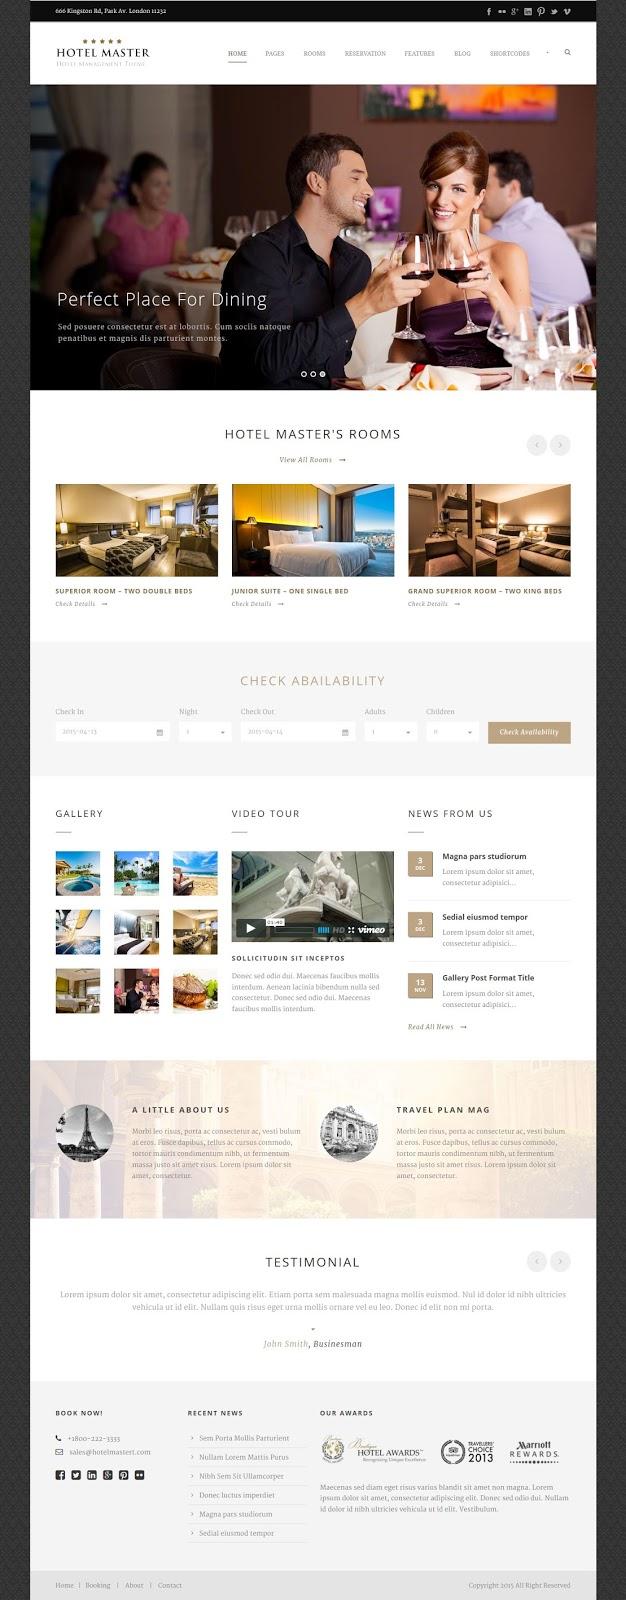 Best Hotel Reservation WordPress Theme